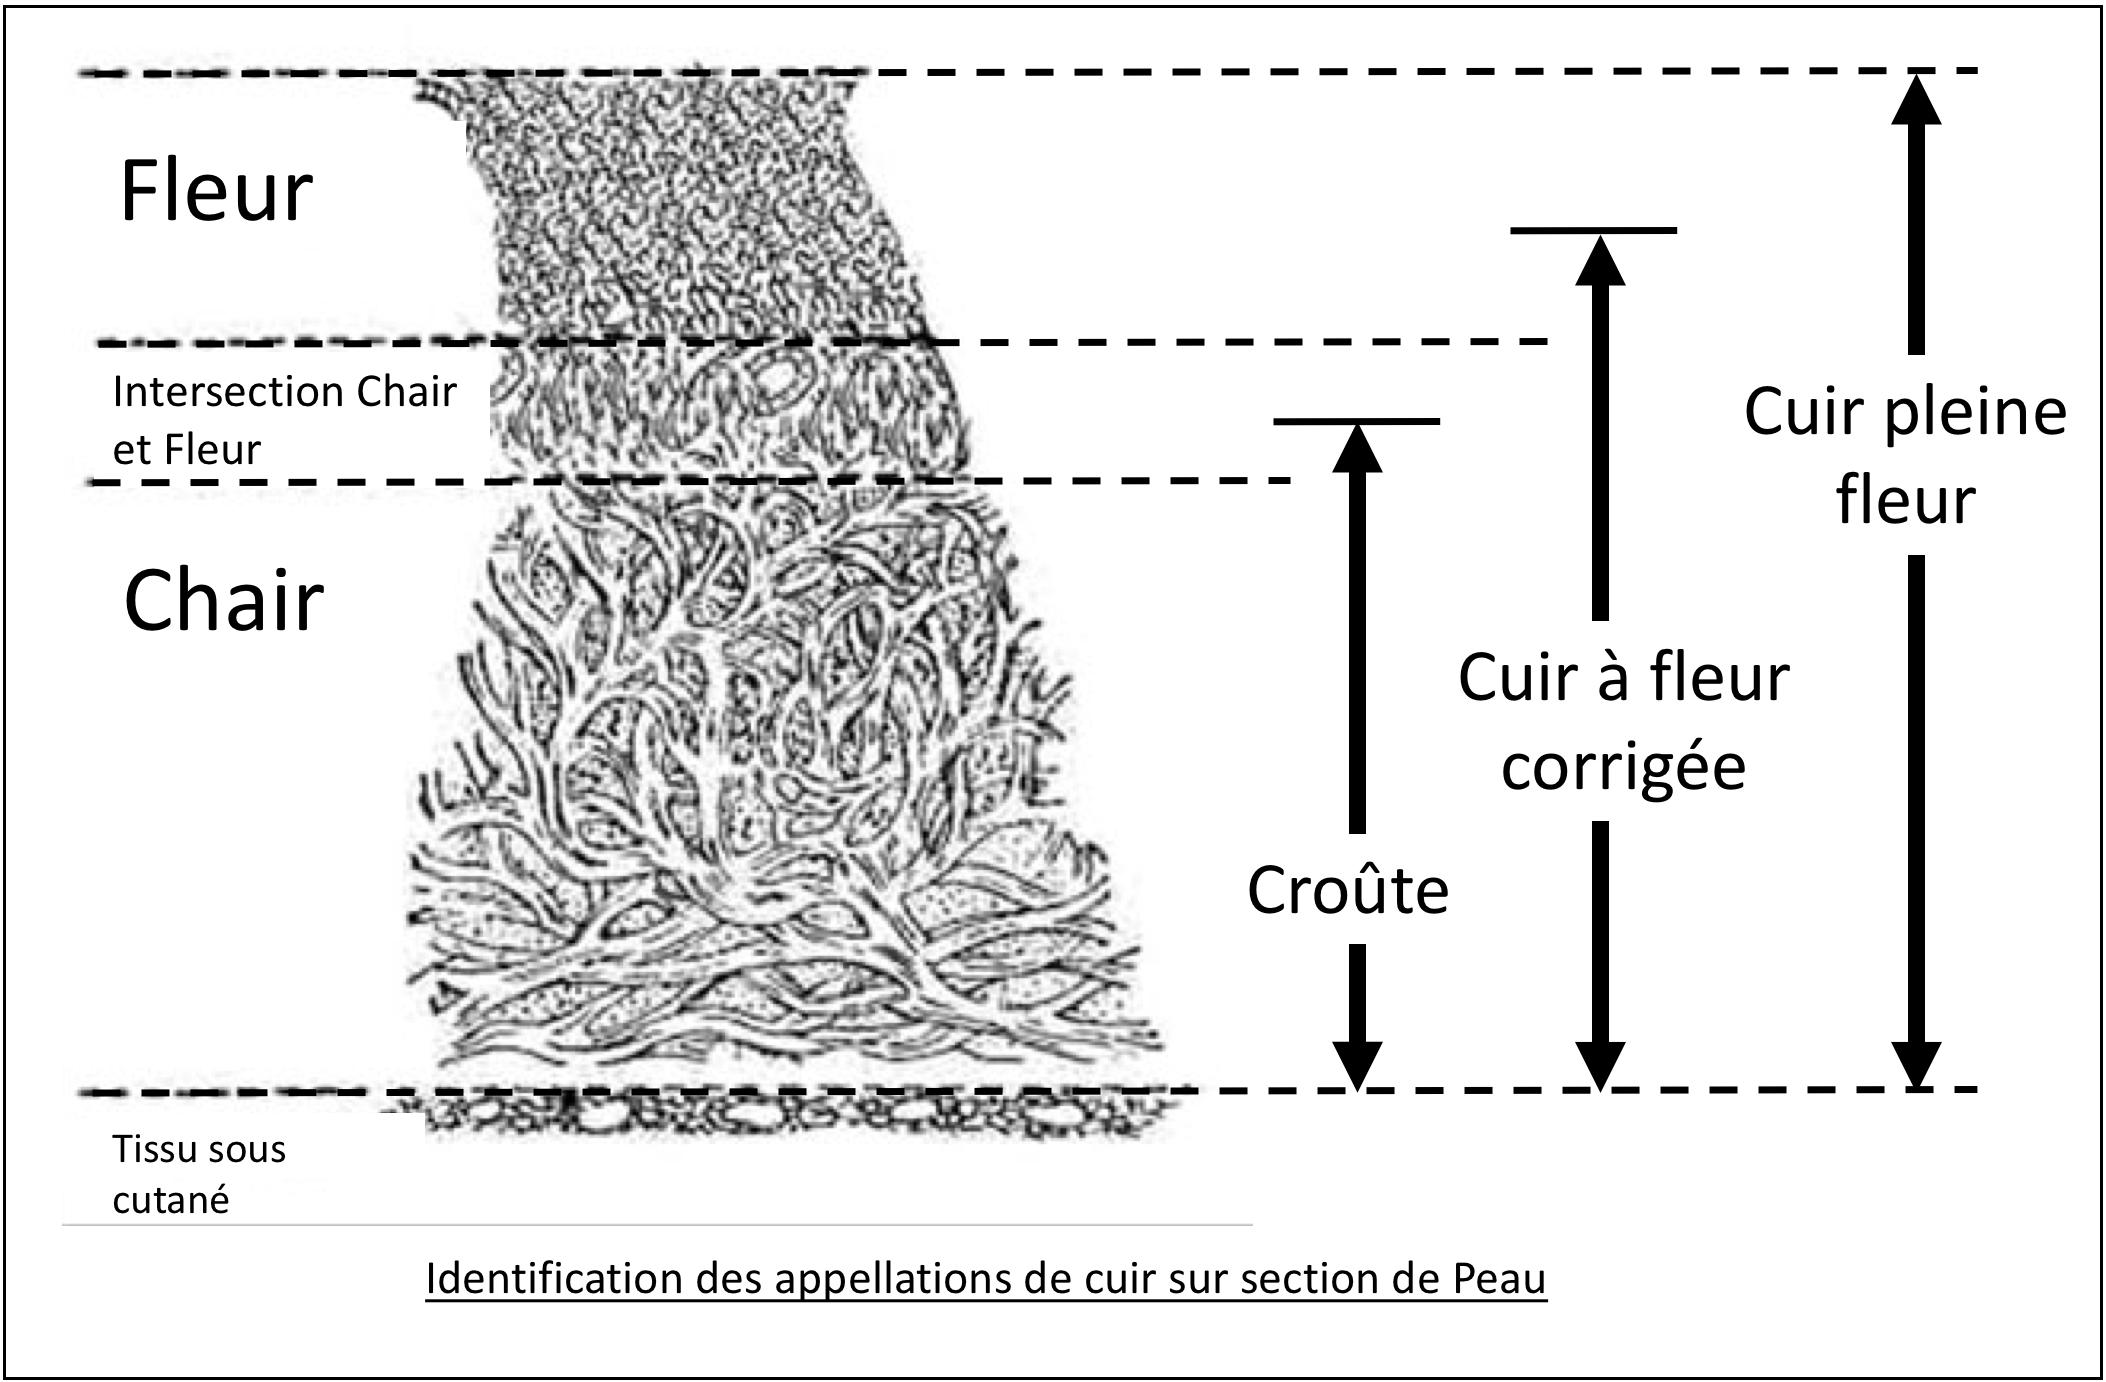 Canapé Fleur De Cuir cuir pleine fleur — wikipédia